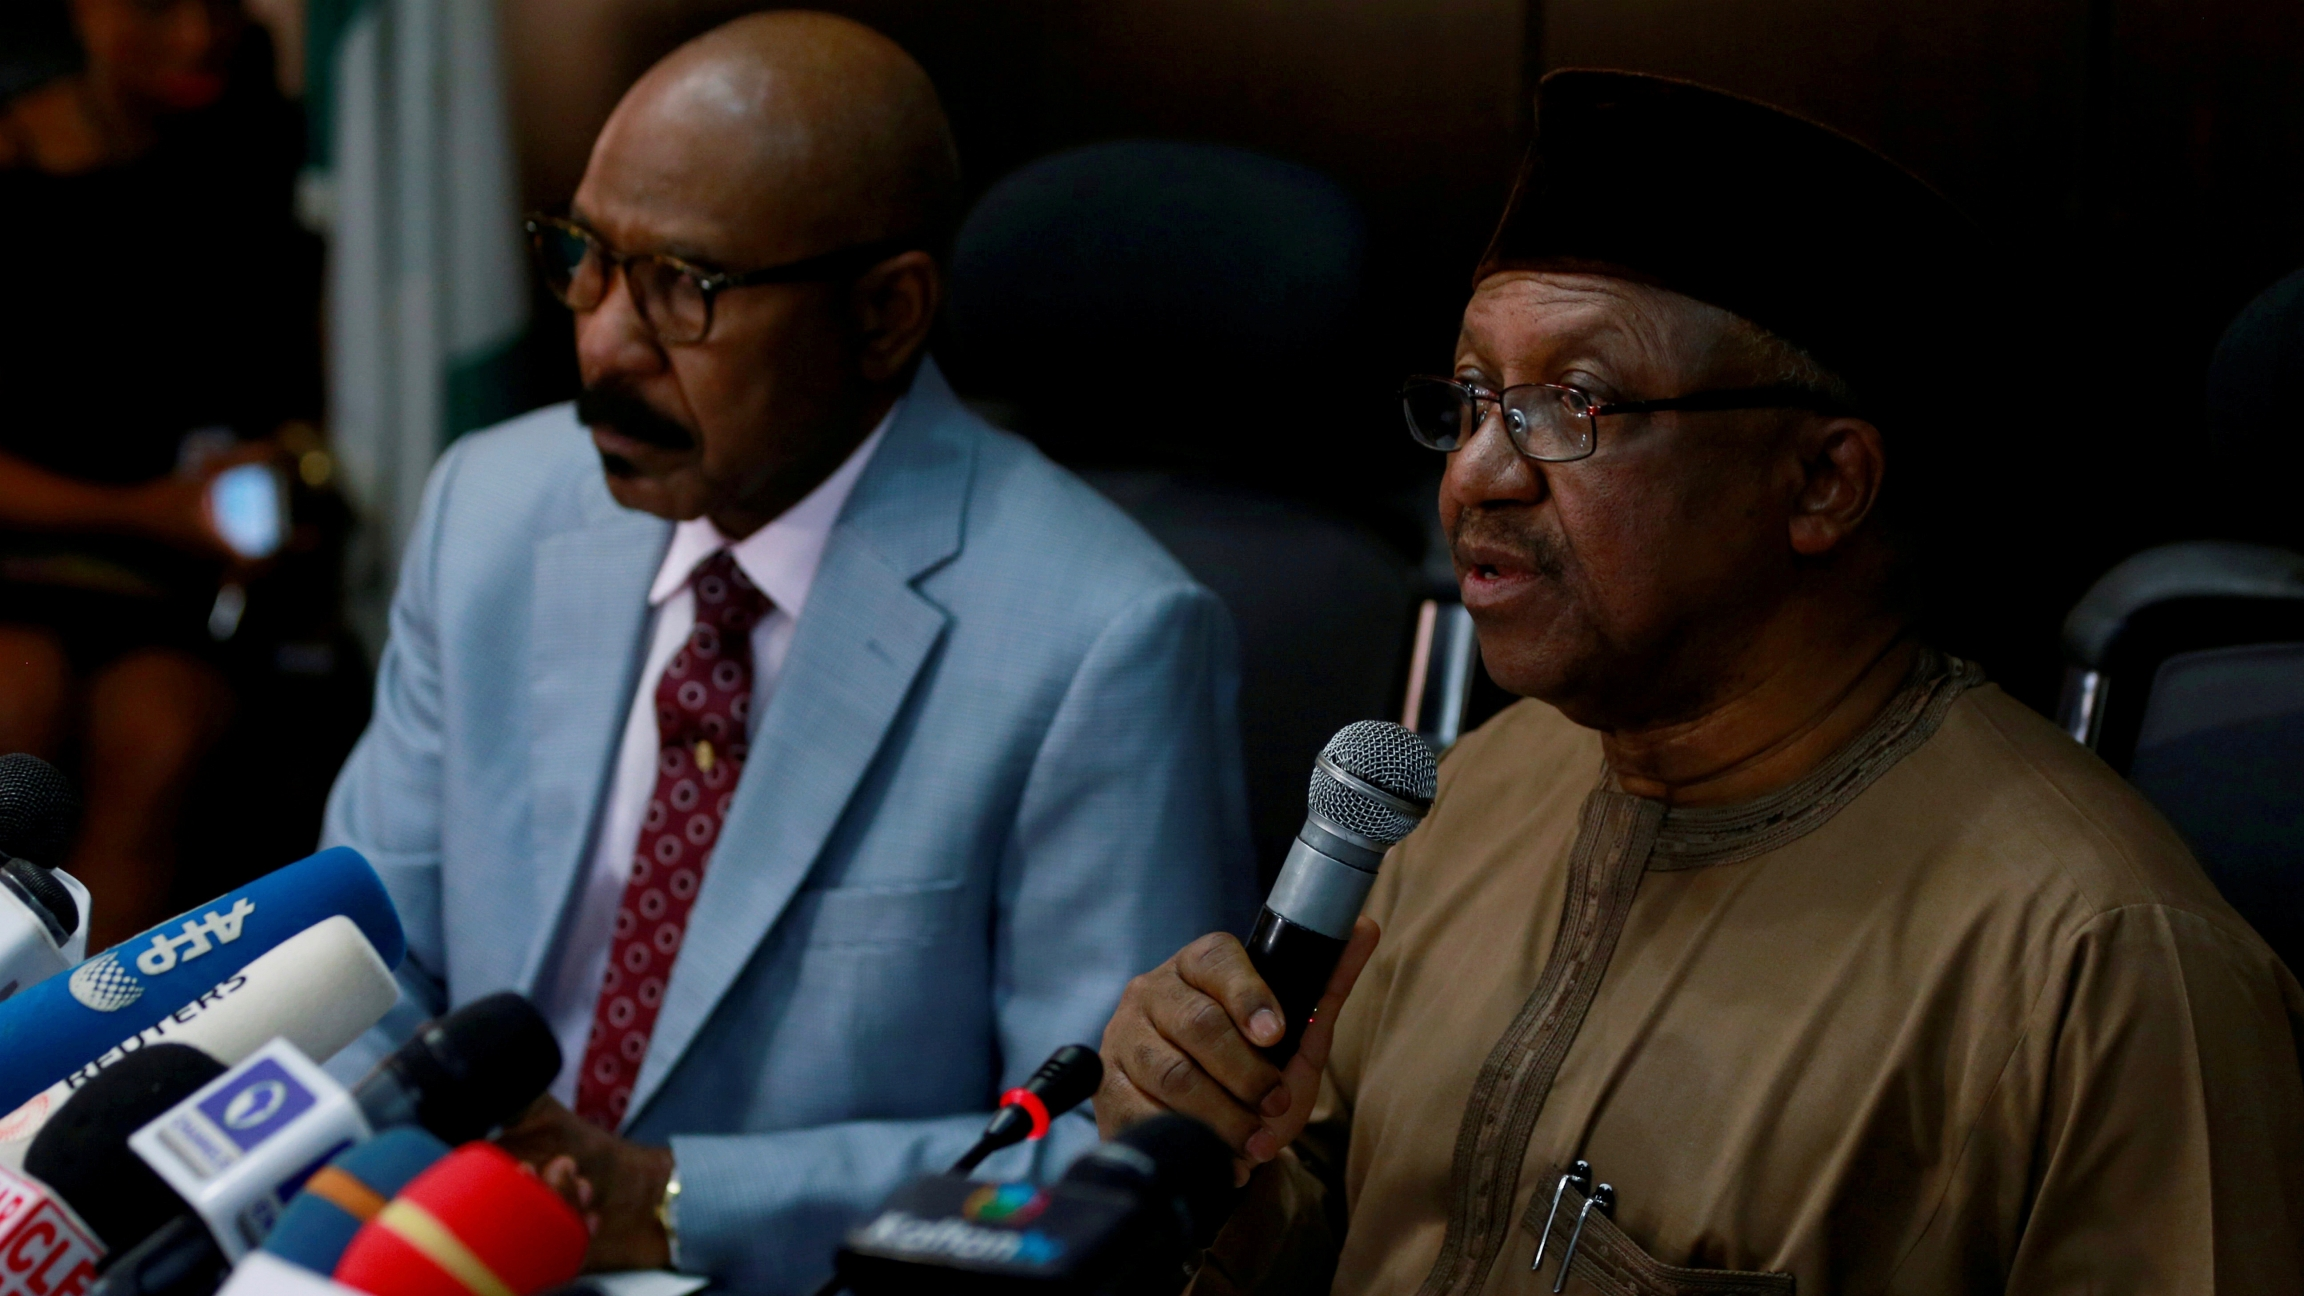 Nigeria's Minister of Health Osagie Ehanire briefs the media on the status of the novel coronavirus COVID-19 in Abuja,Nigeria, March 2, 2020.